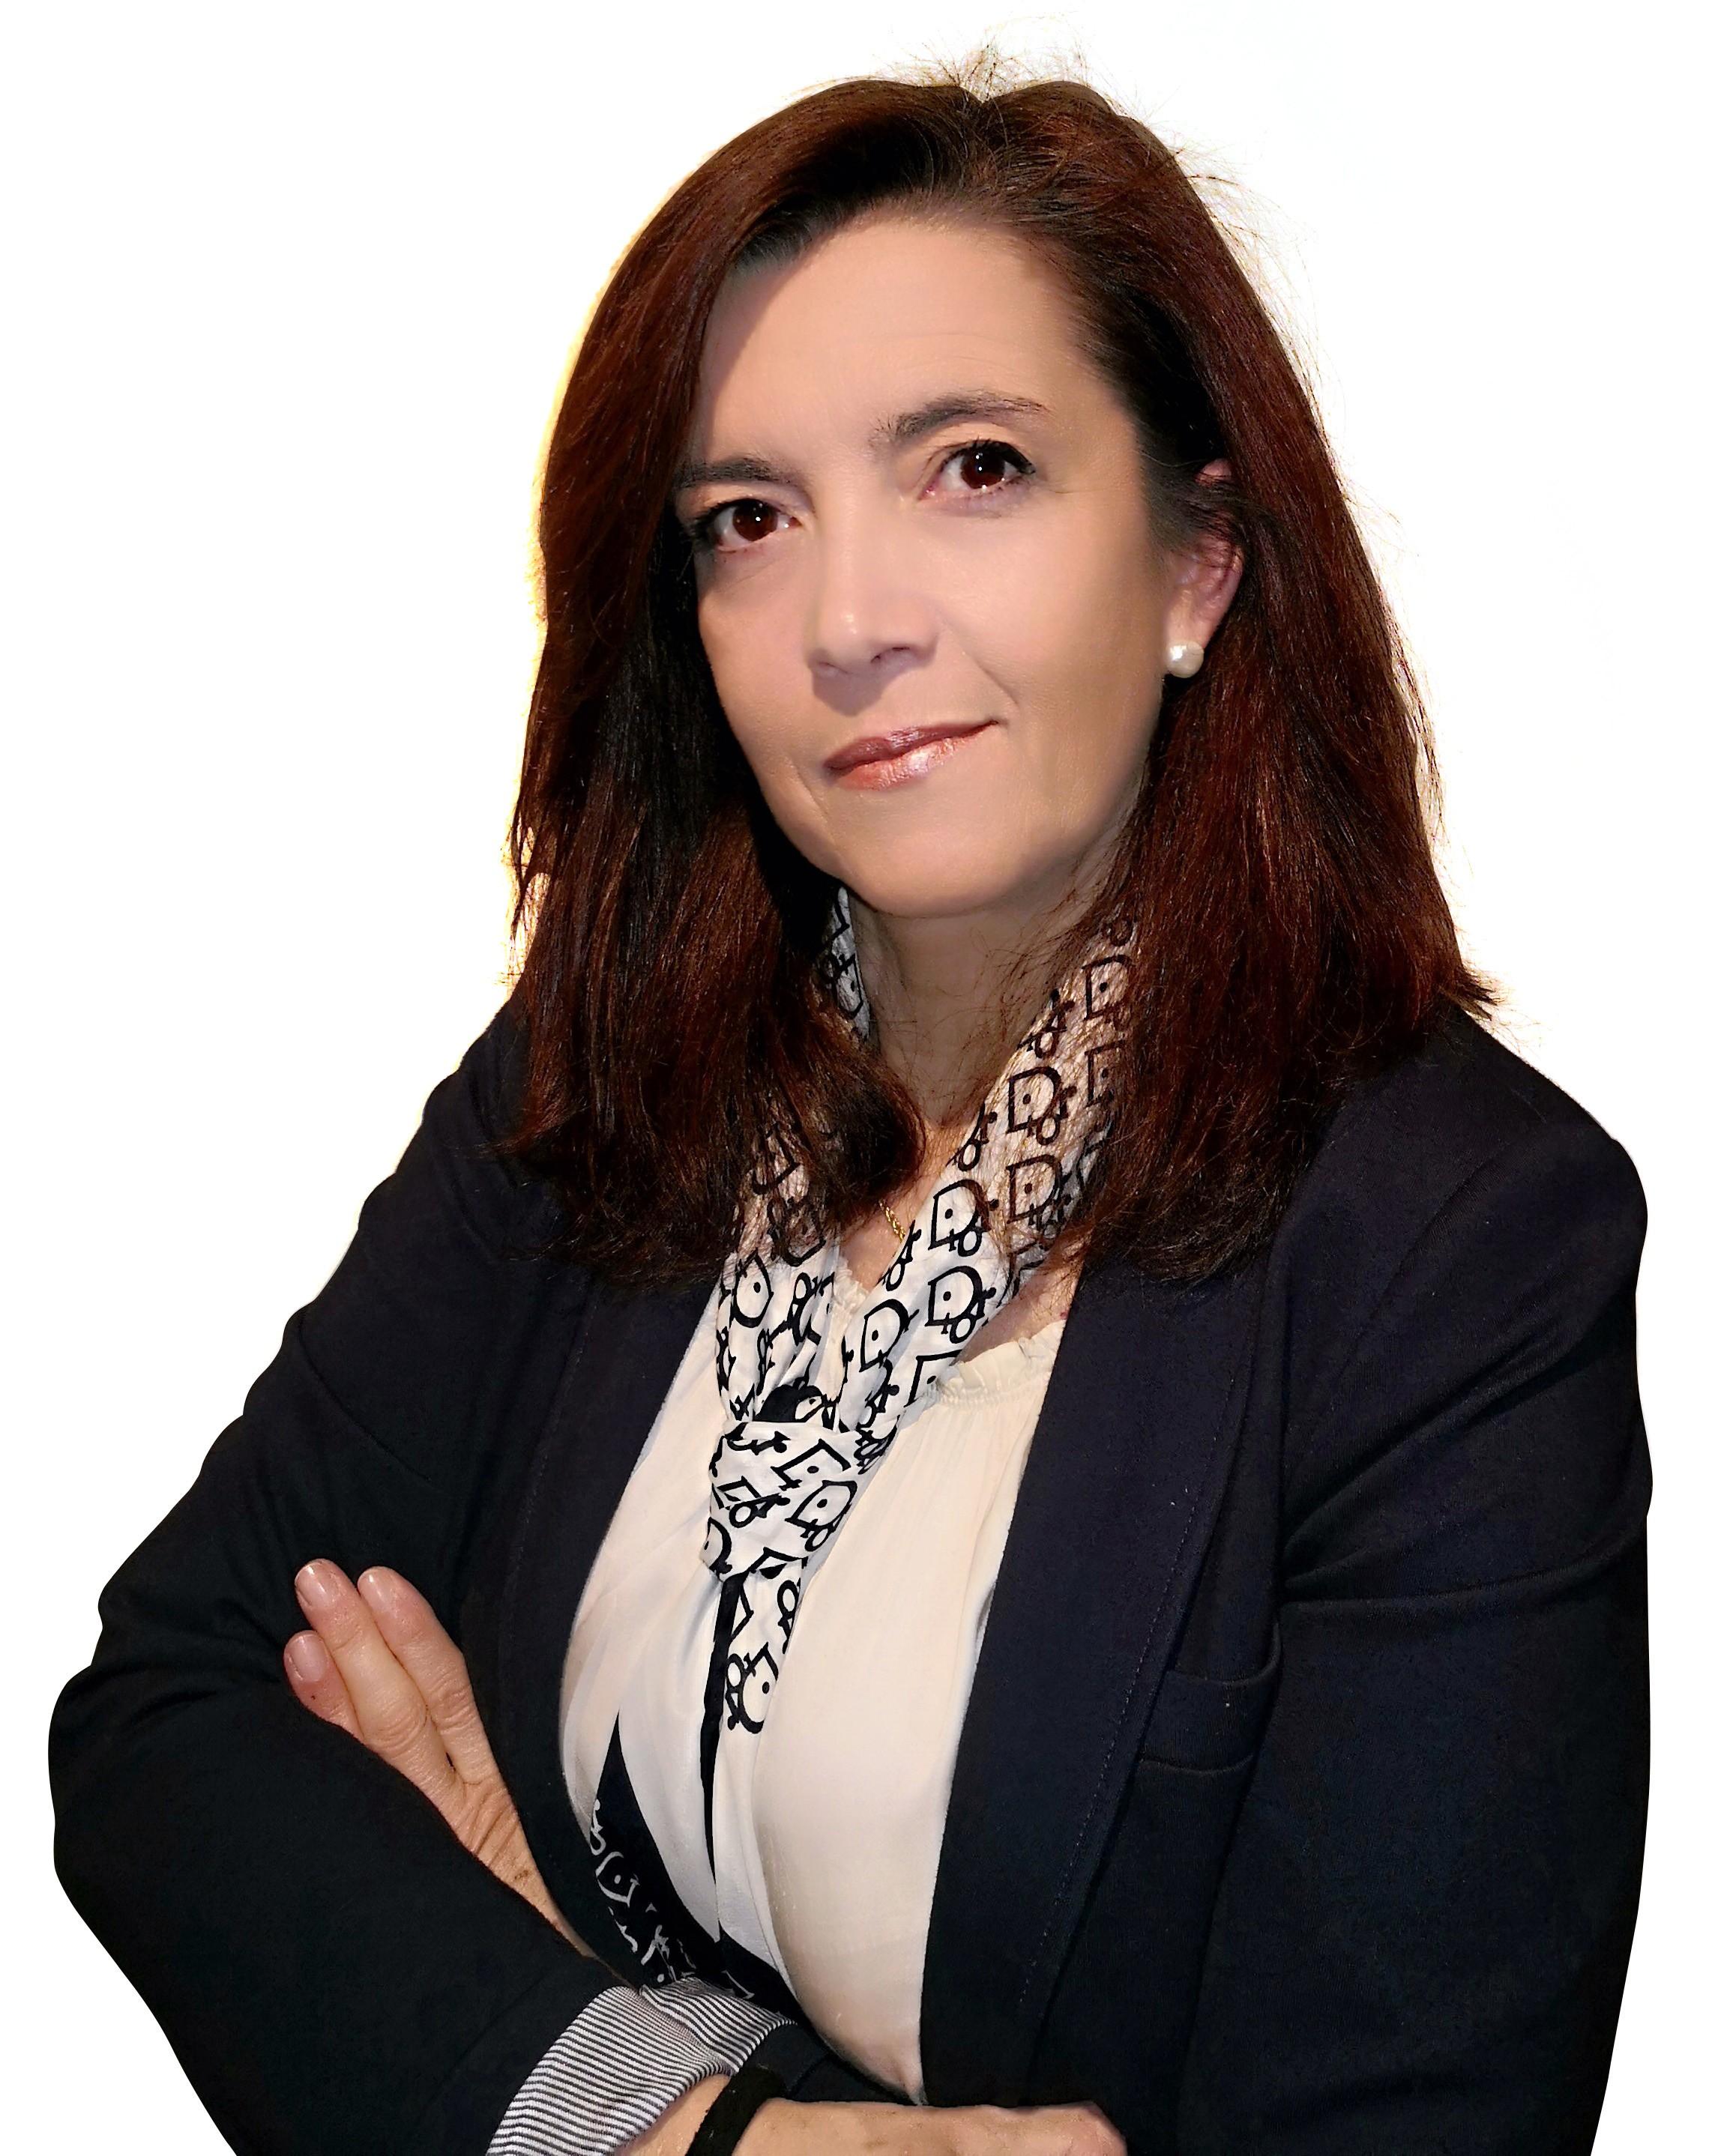 Cristina Pérez de Tudela Gely